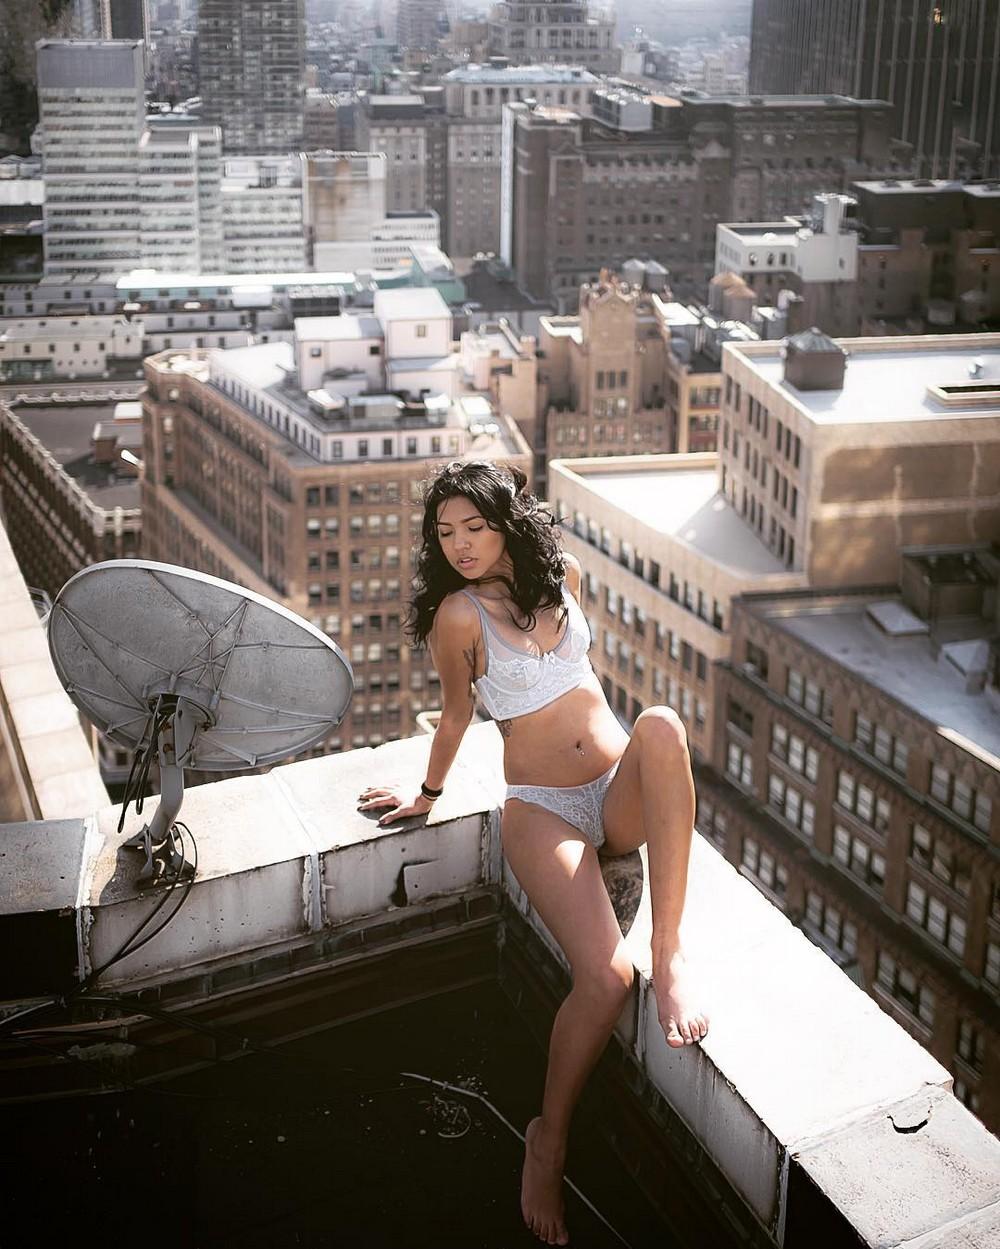 Трахнул на крыше небоскреба 15 фотография